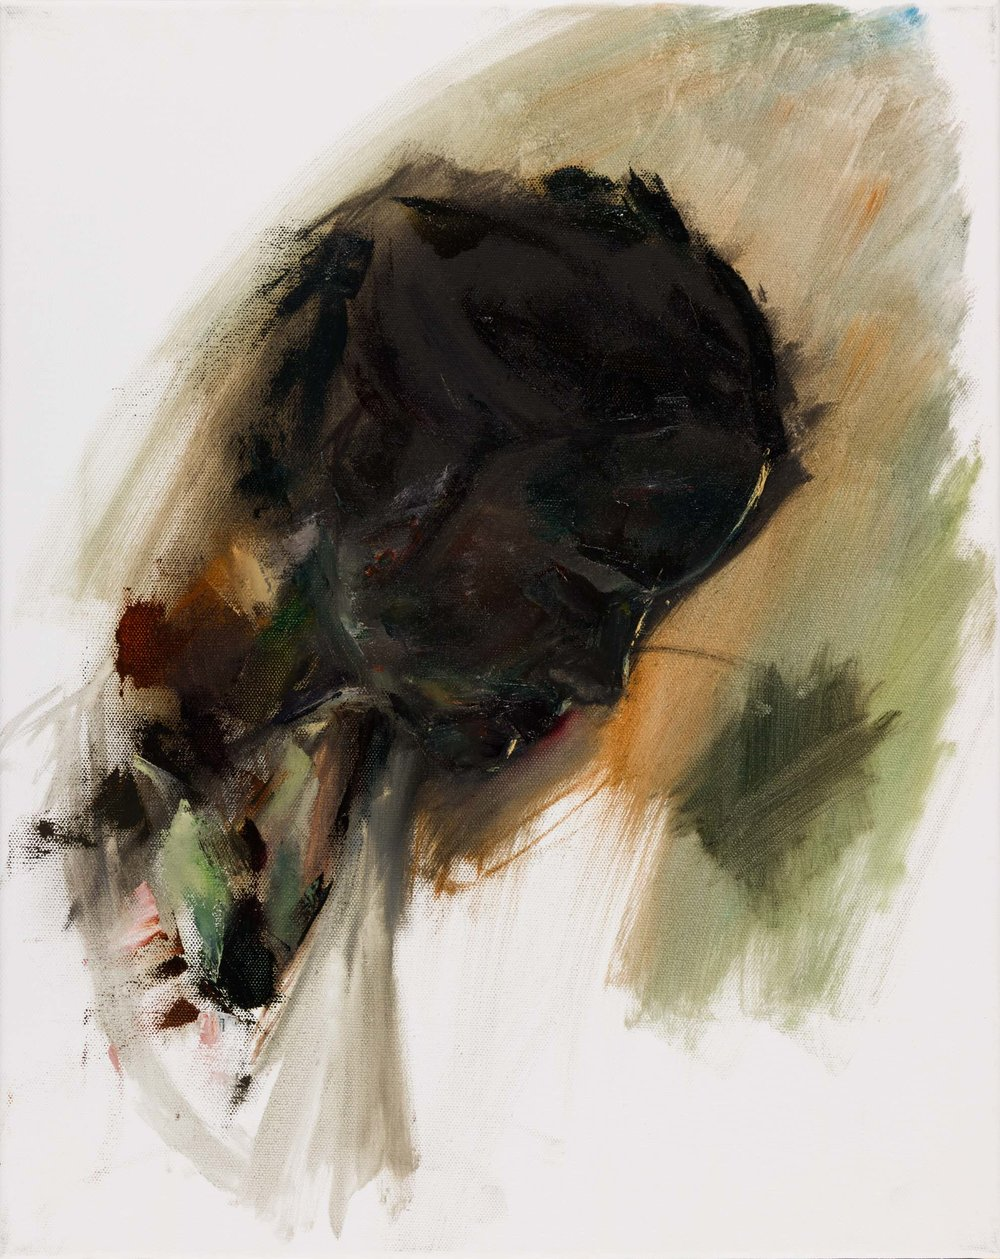 "Original Media:  Oil on Canvas  Original Size:  16"" by 20""  Original Date:  Feb 2017"